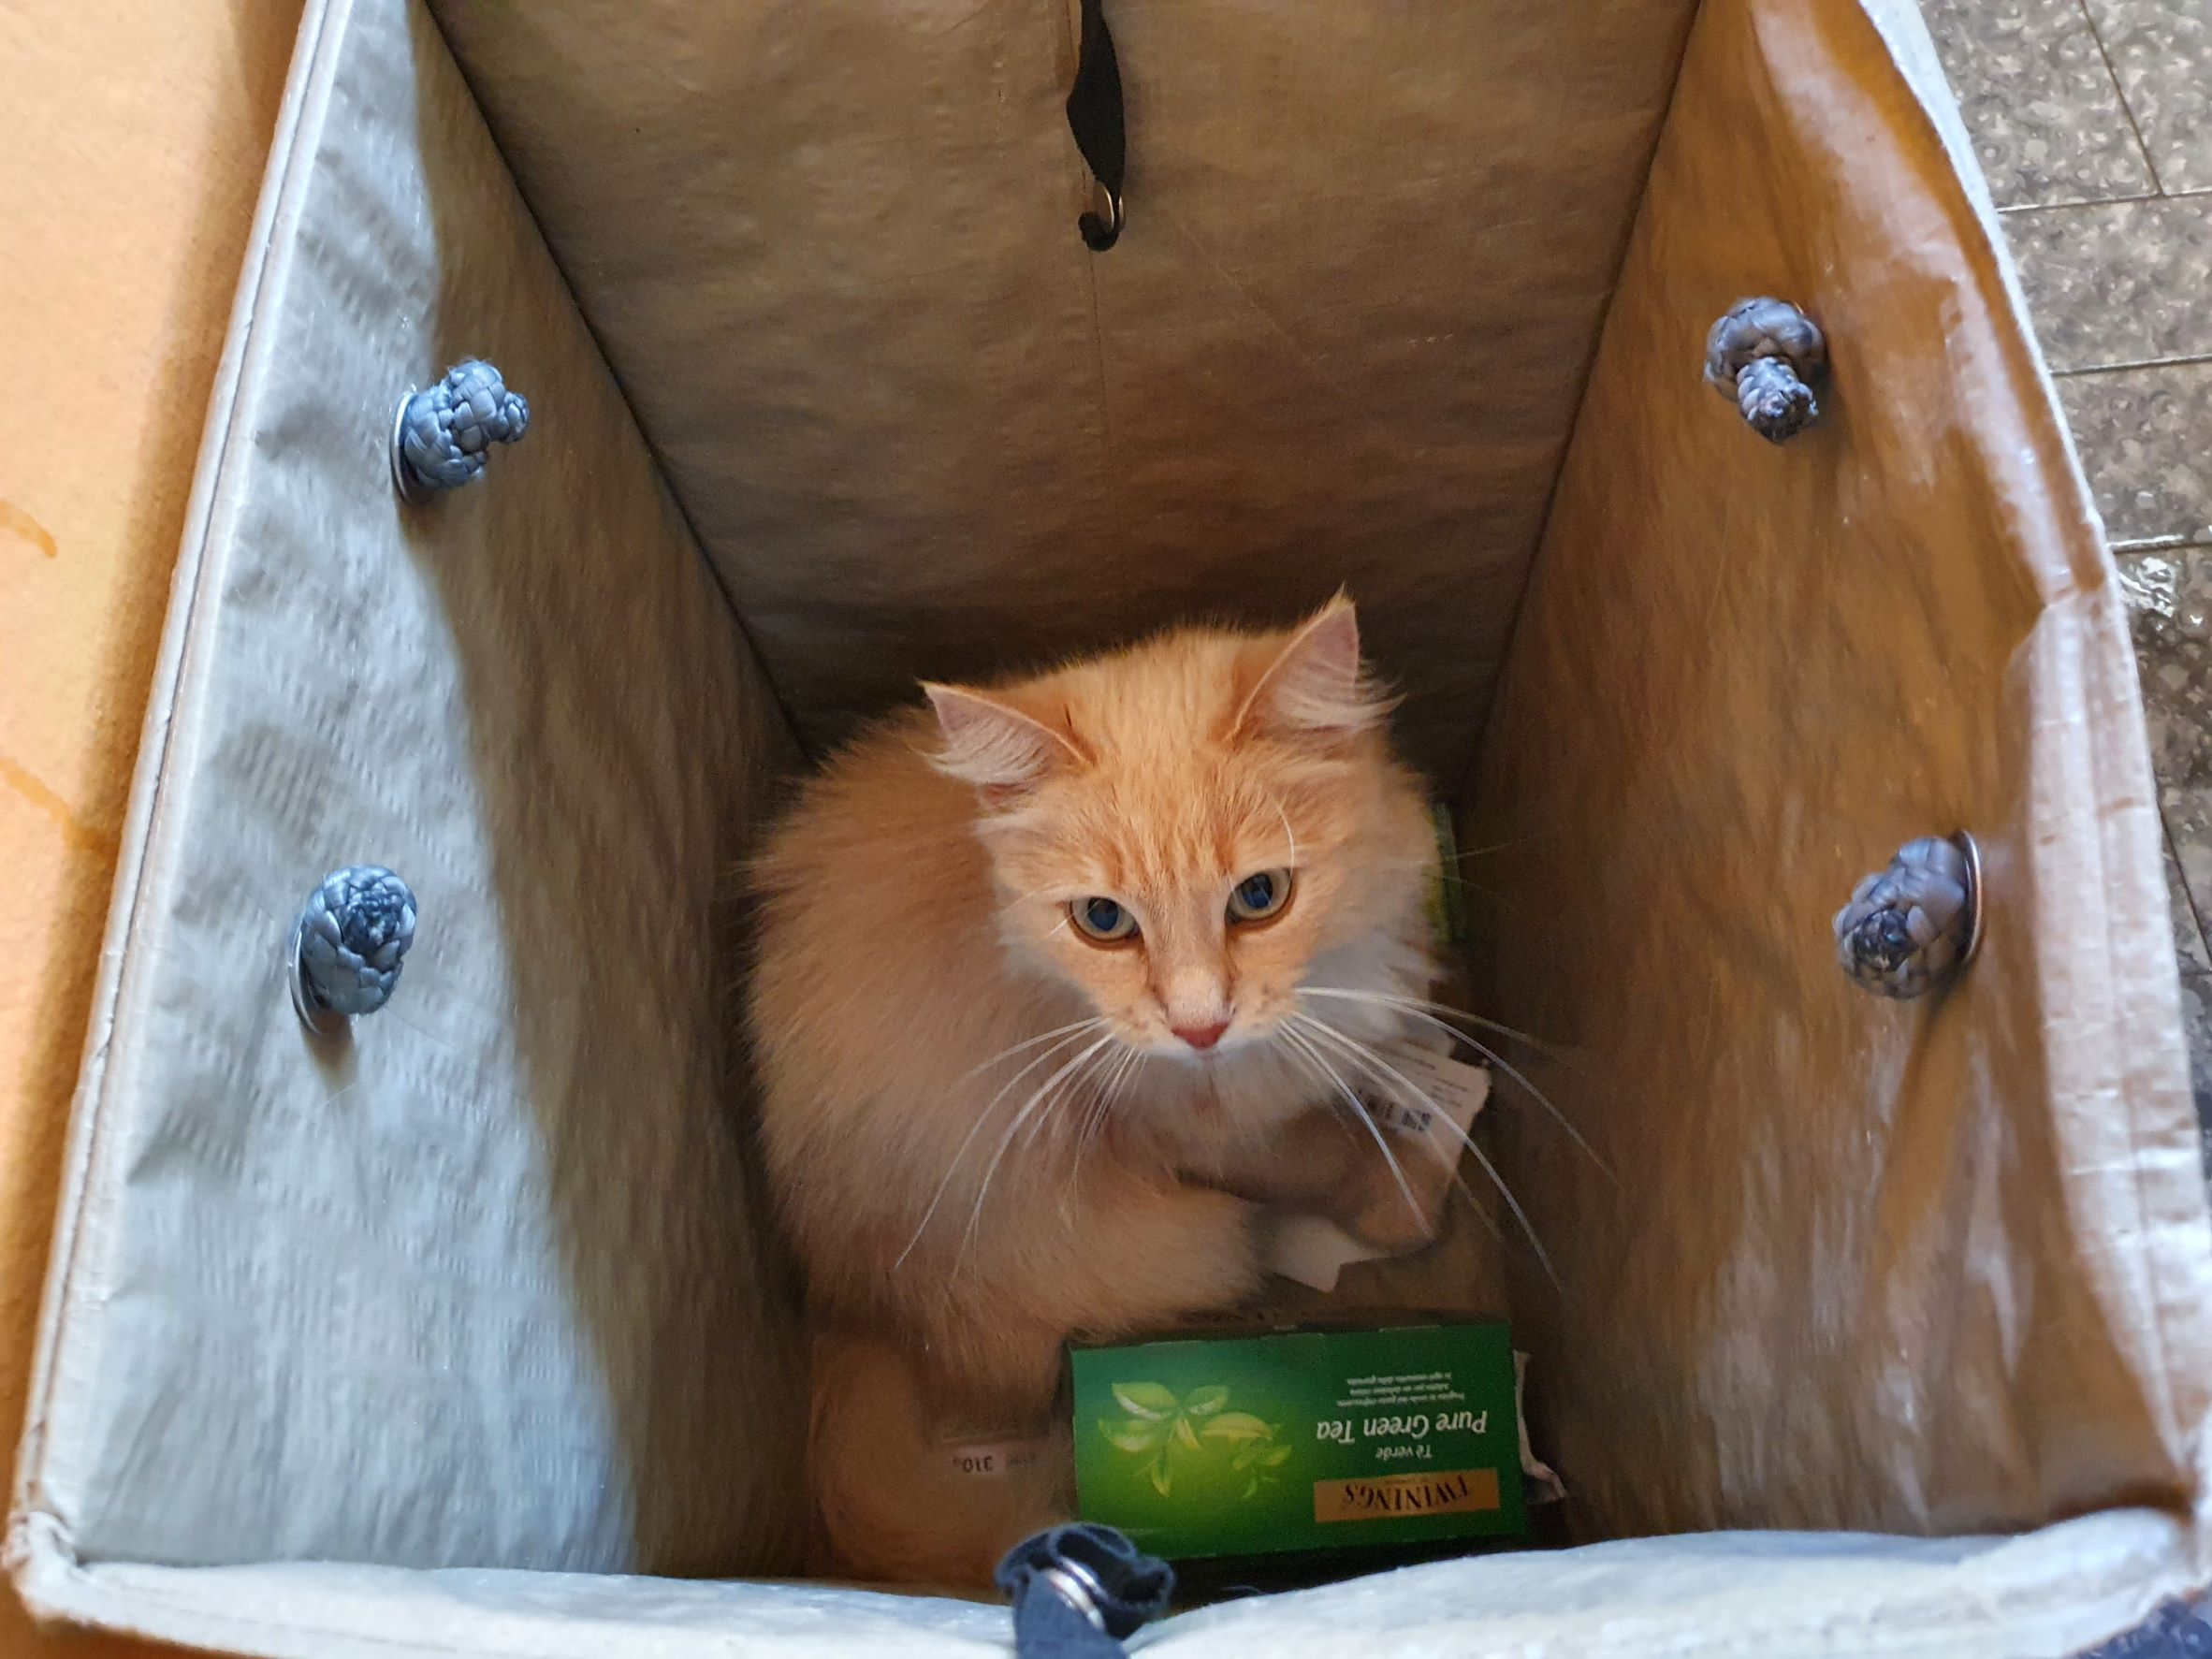 Streaky - Pussycat in the recycling bins - Domus Saura luglio 2021 - foto TT